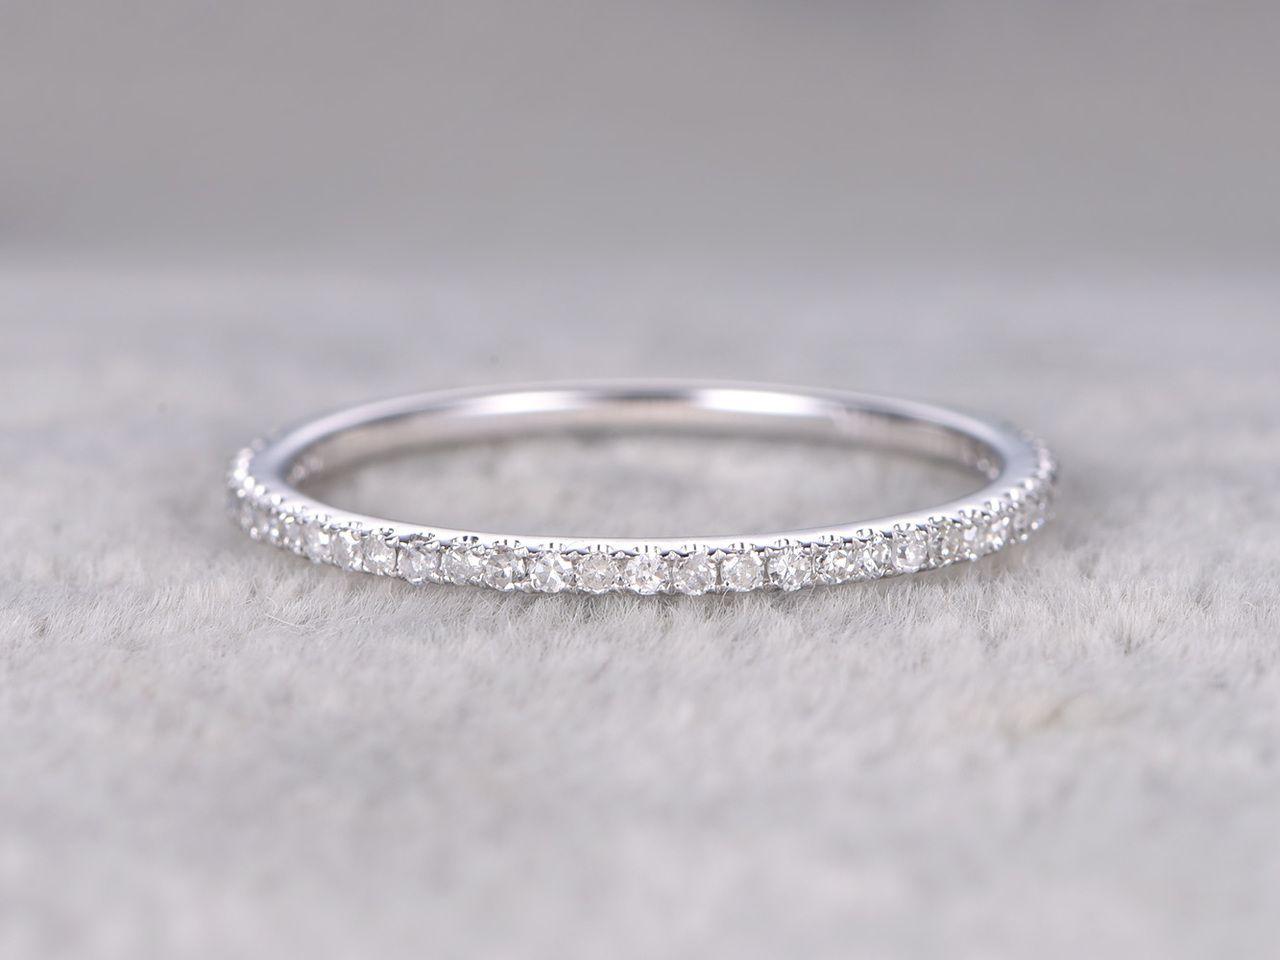 Diamond 3 4 Eternity Rings 14k White Gold Thin Micro Pave Wedding Band Stacking Ring Pave Wedding Bands Micro Pave Wedding Band Wedding Ring Bands